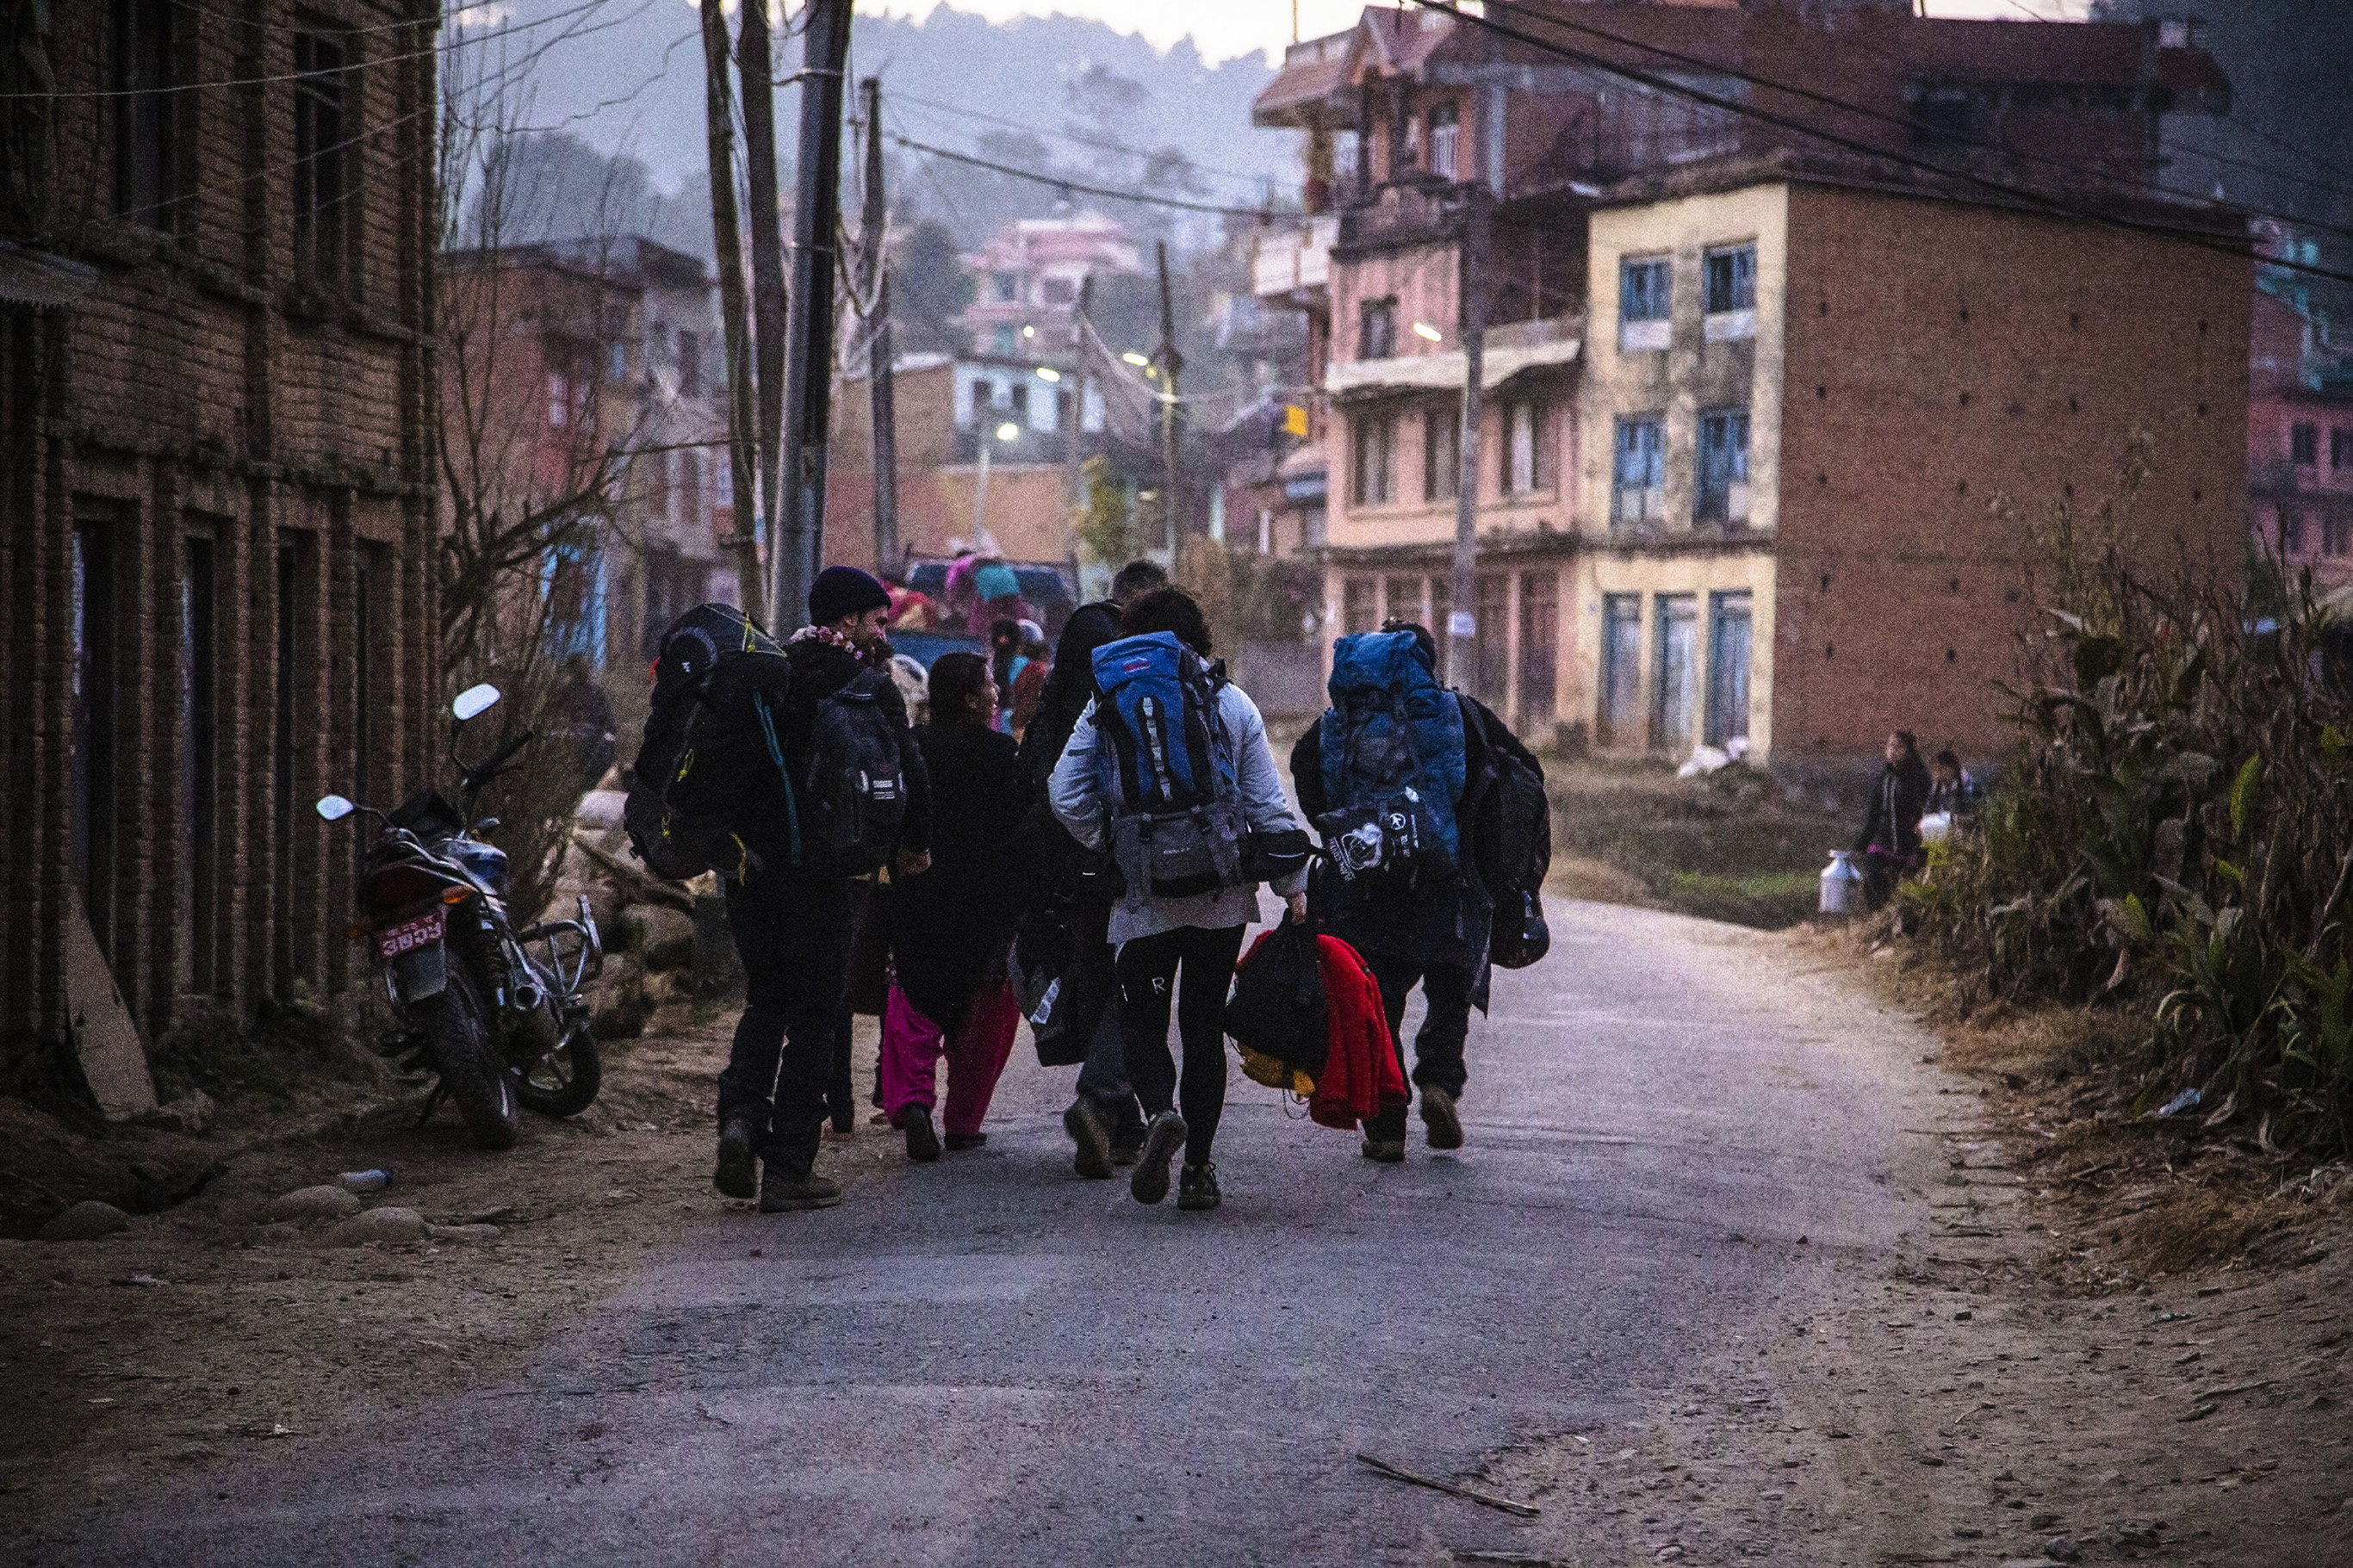 Nepal Adventure in Nepal, Asia - G Adventures